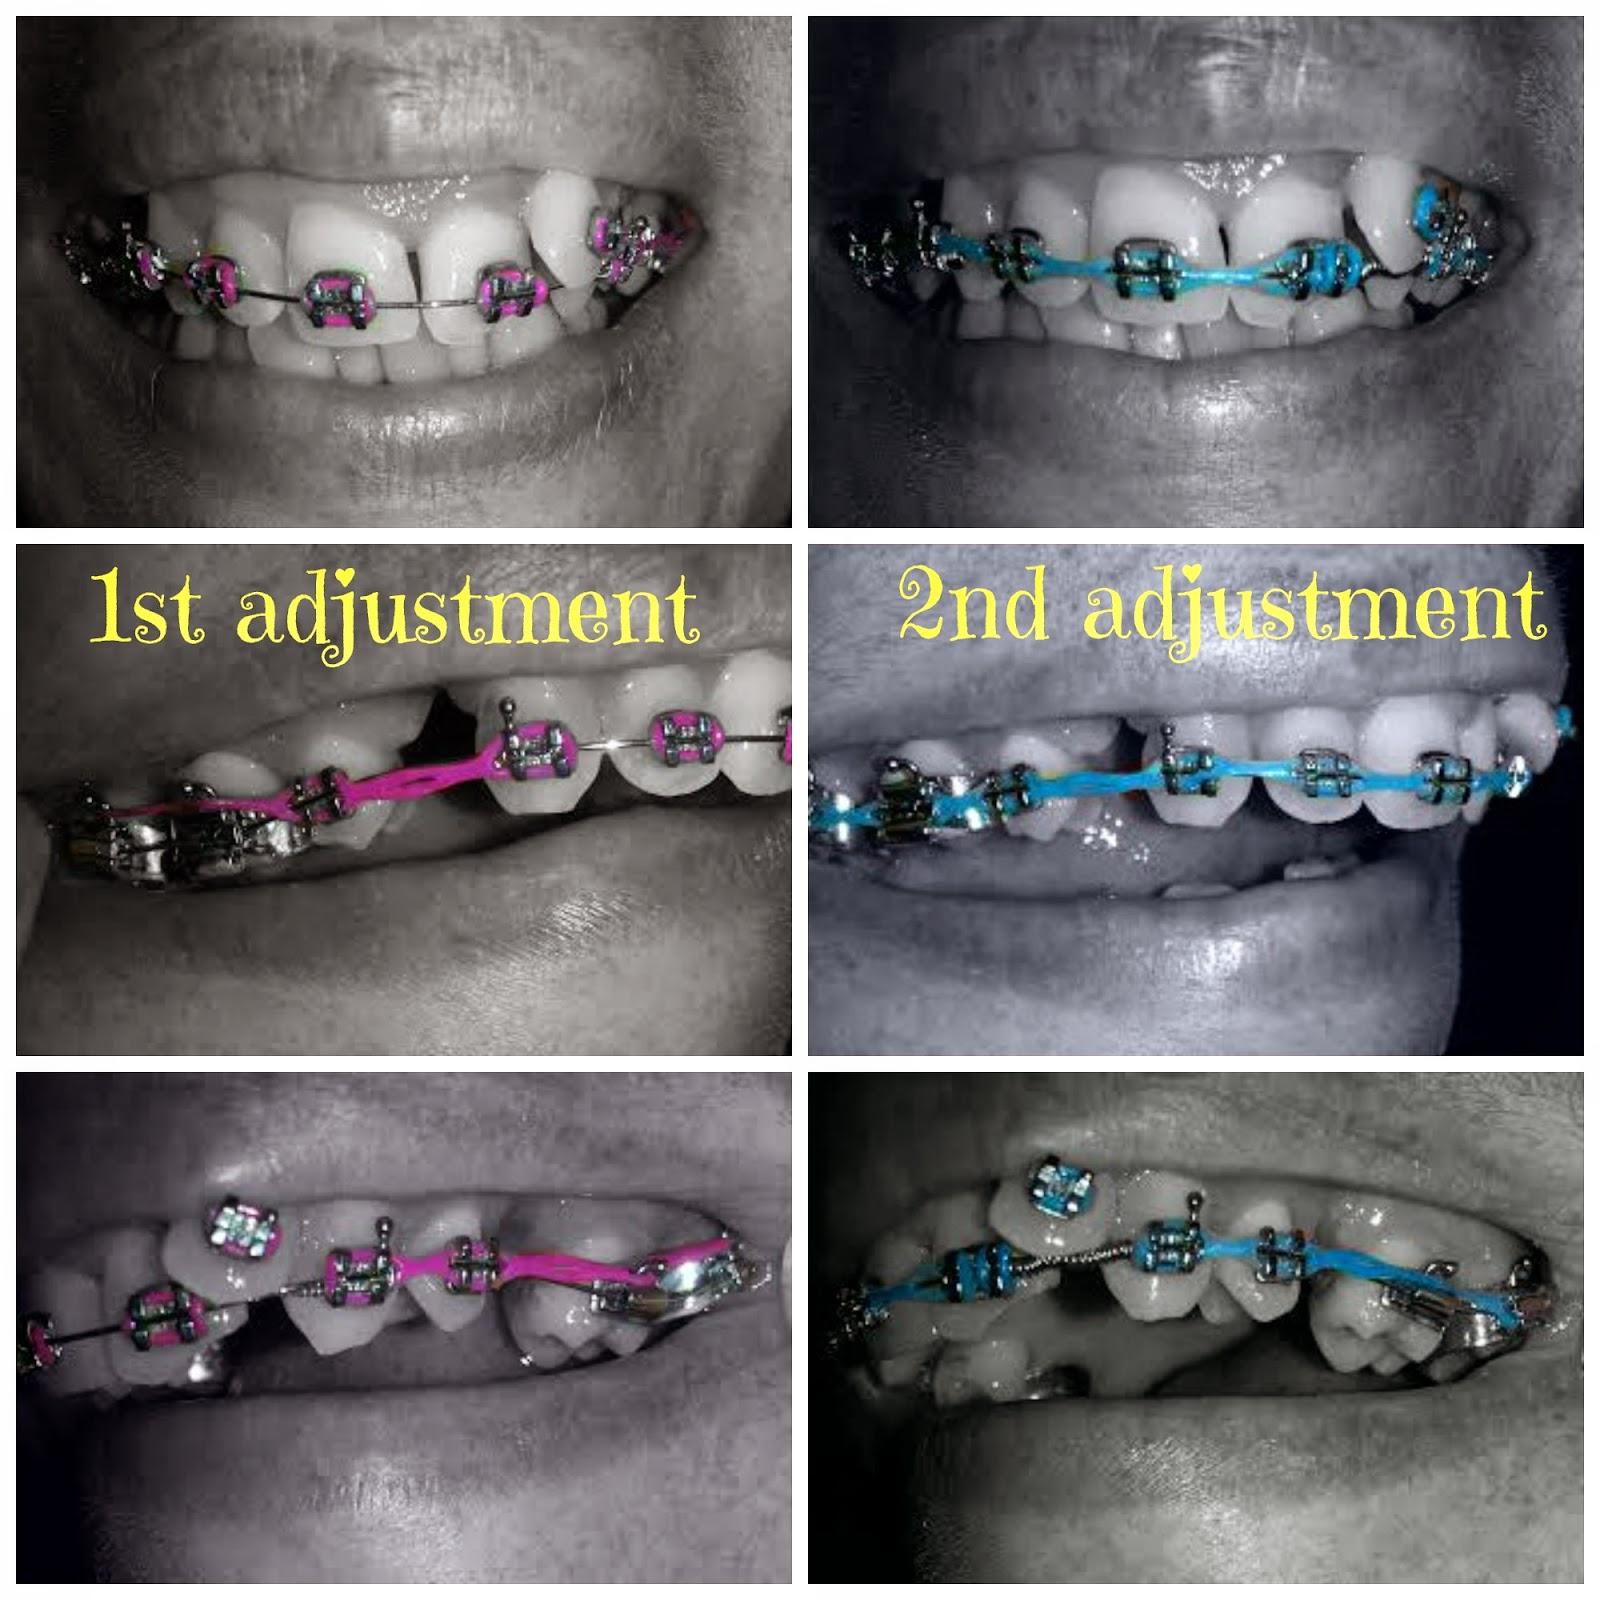 Adult Braces - My Journey : 2nd Braces Adjustment